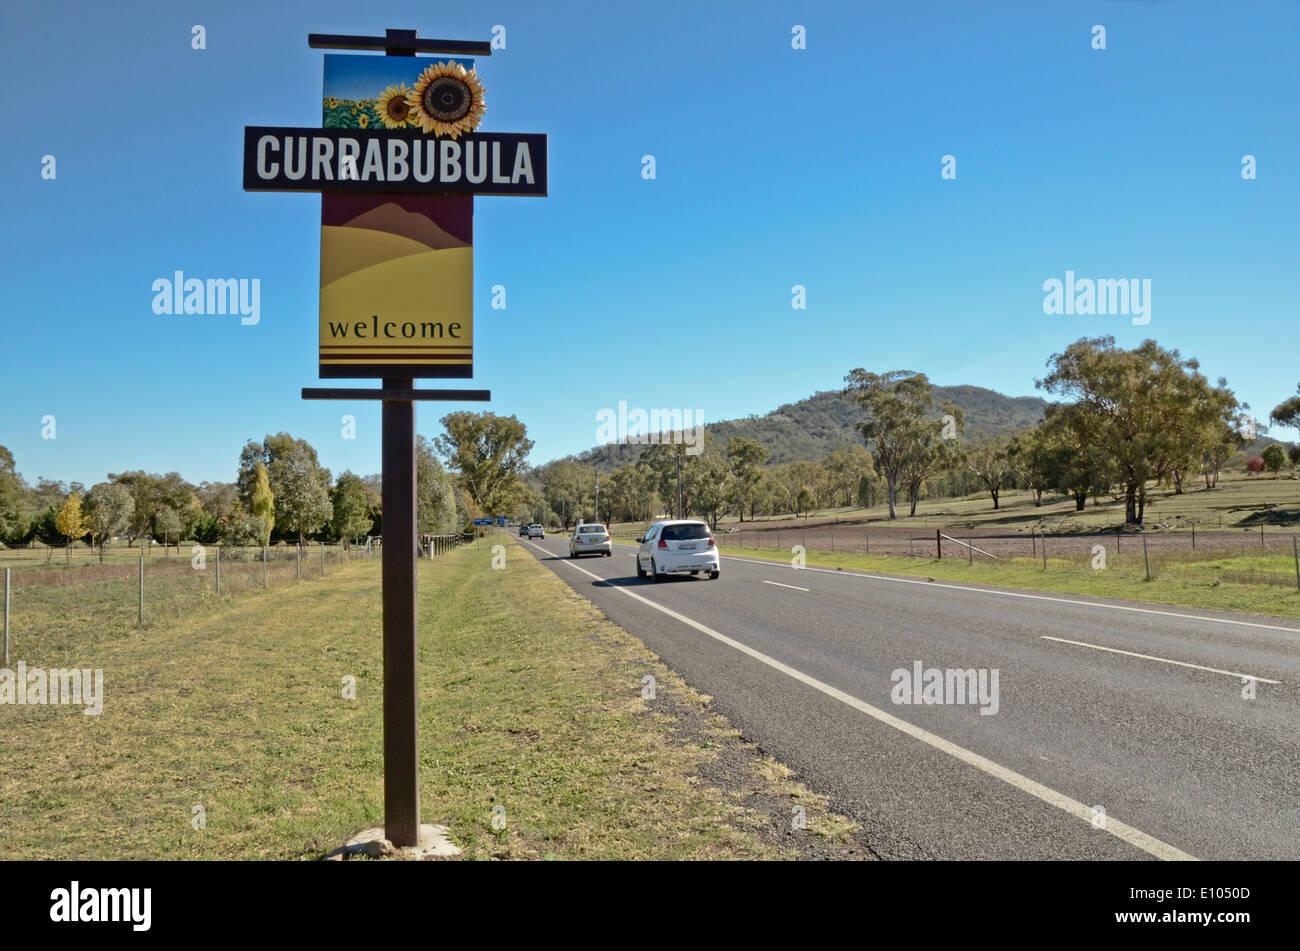 Welcome to Currabubula NSW Australia roadside sign - Stock Image